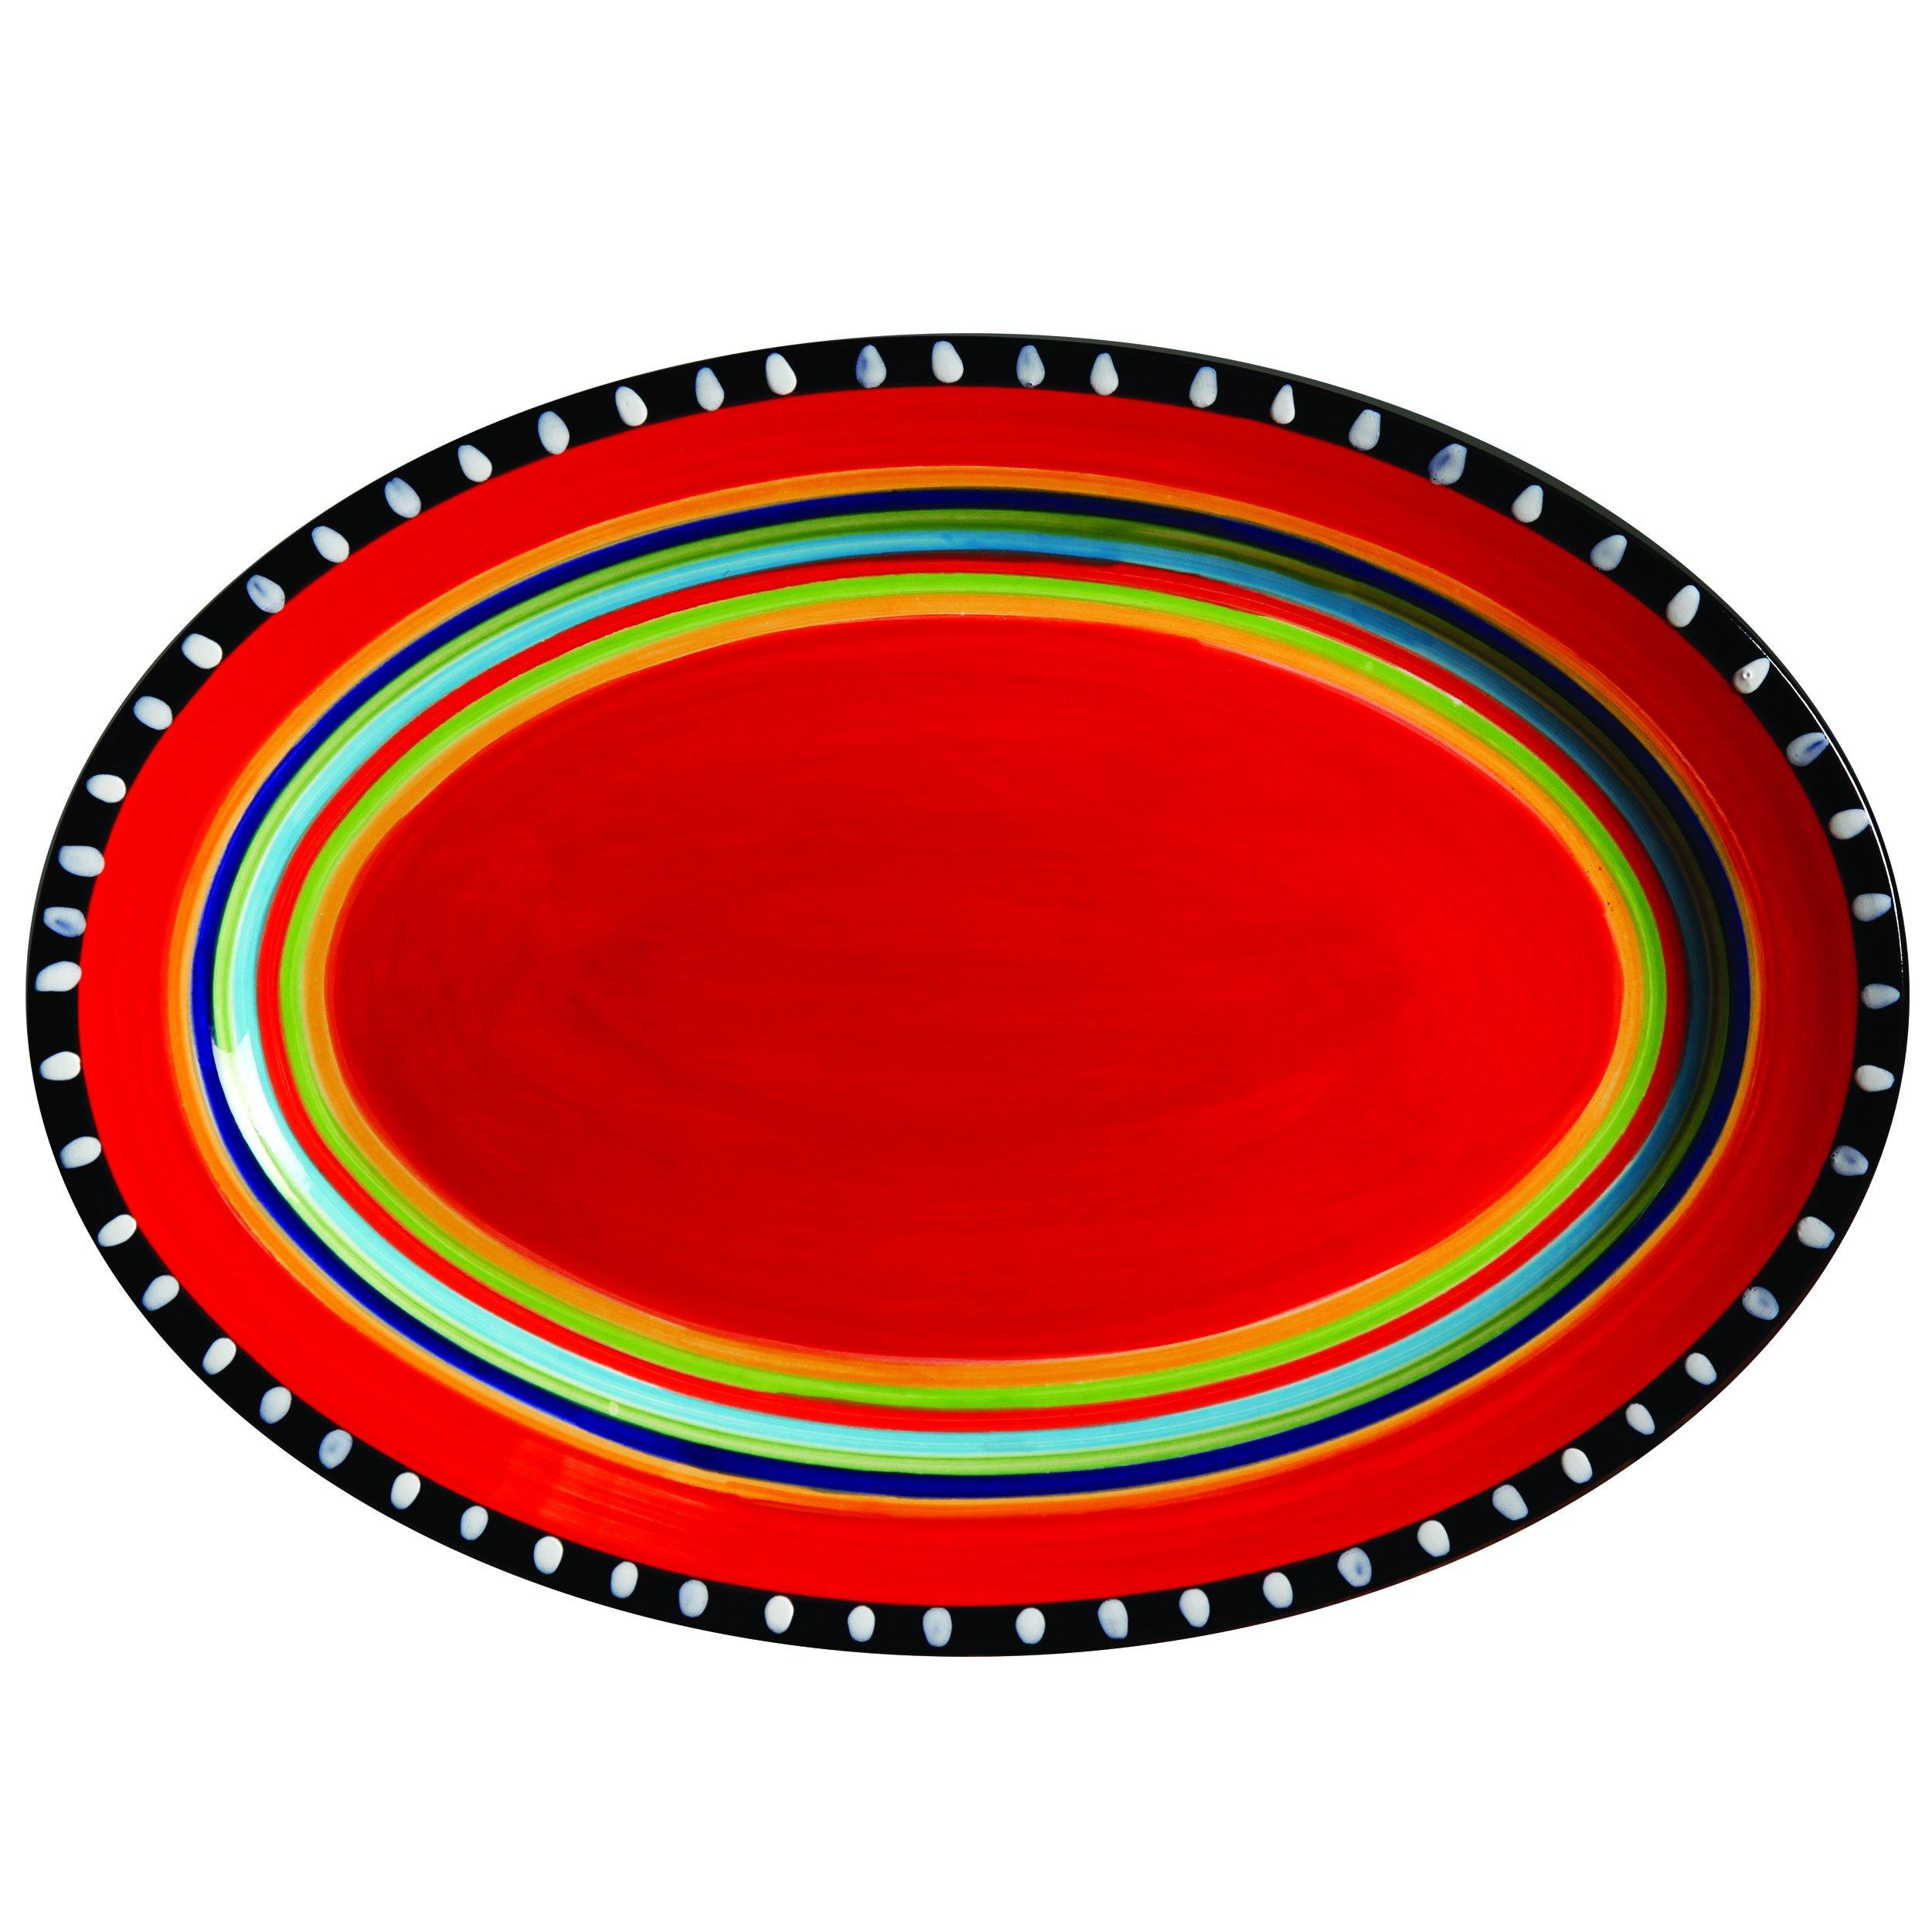 Gibson Elite 100899.01RM Pueblo Springs 14'' Handpainted Oval Platter, Multicolor